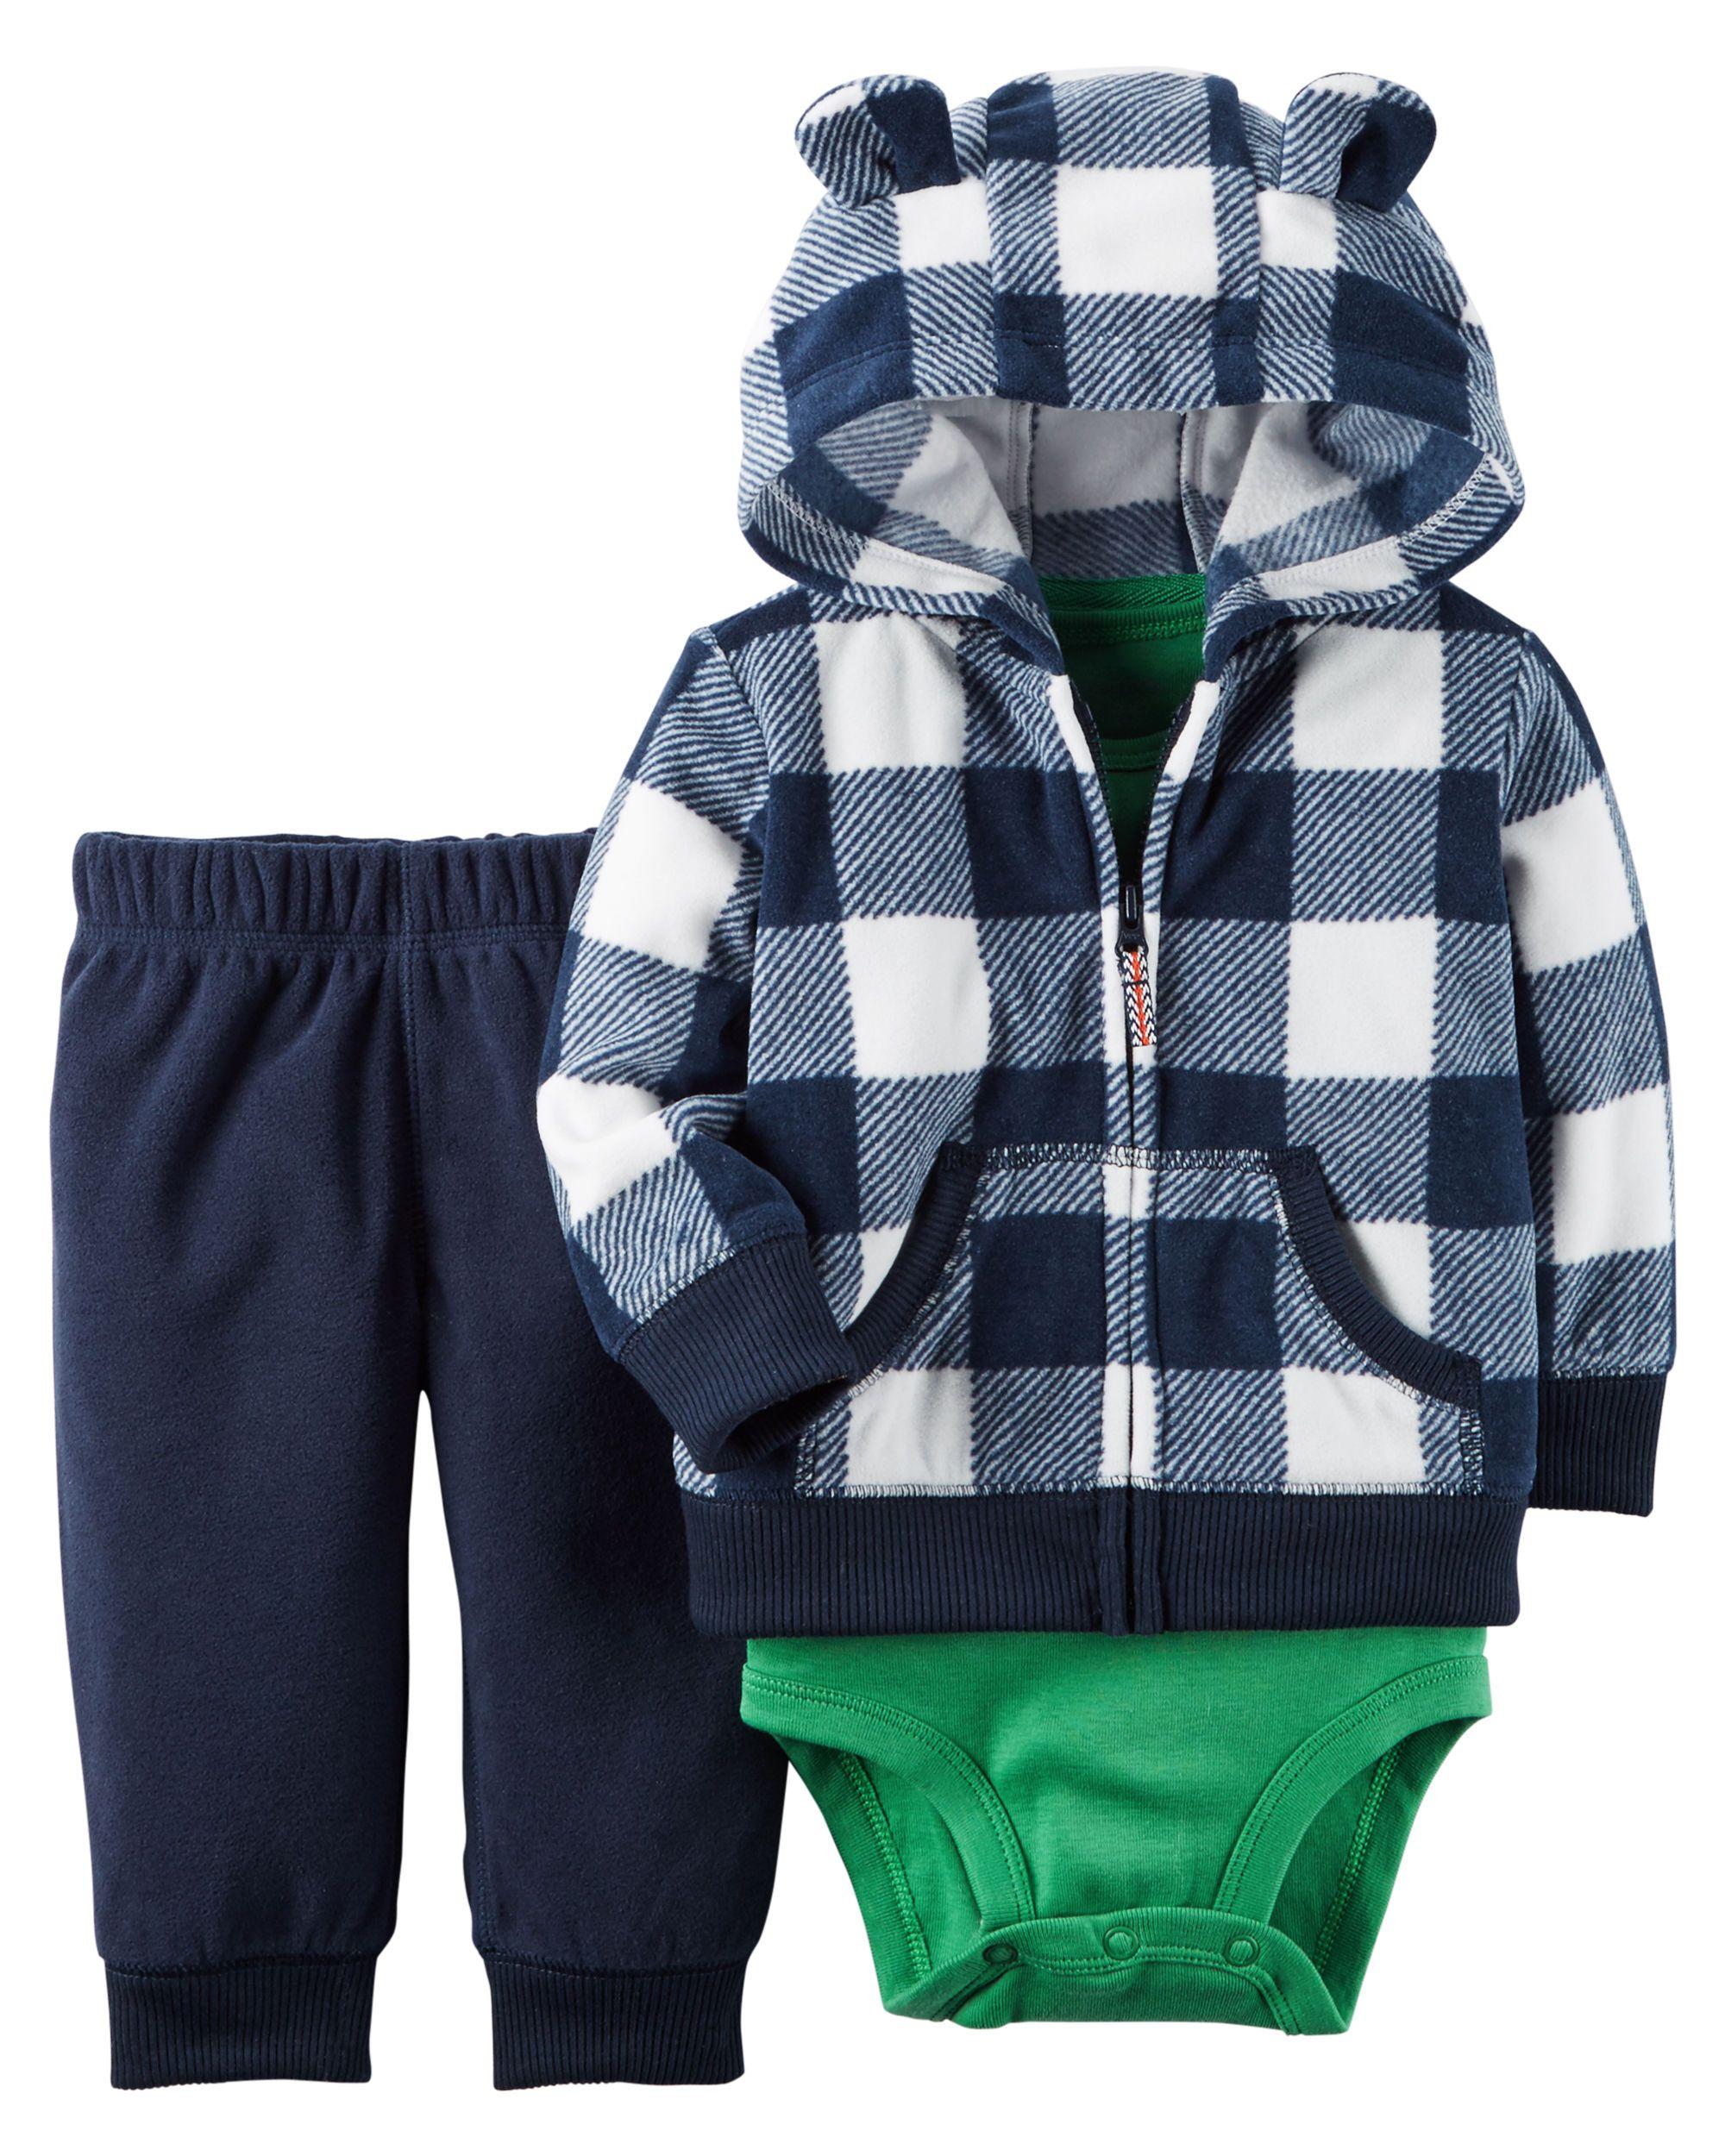 Baby Boy 3 Piece Little Jacket Set Carters Com My Son